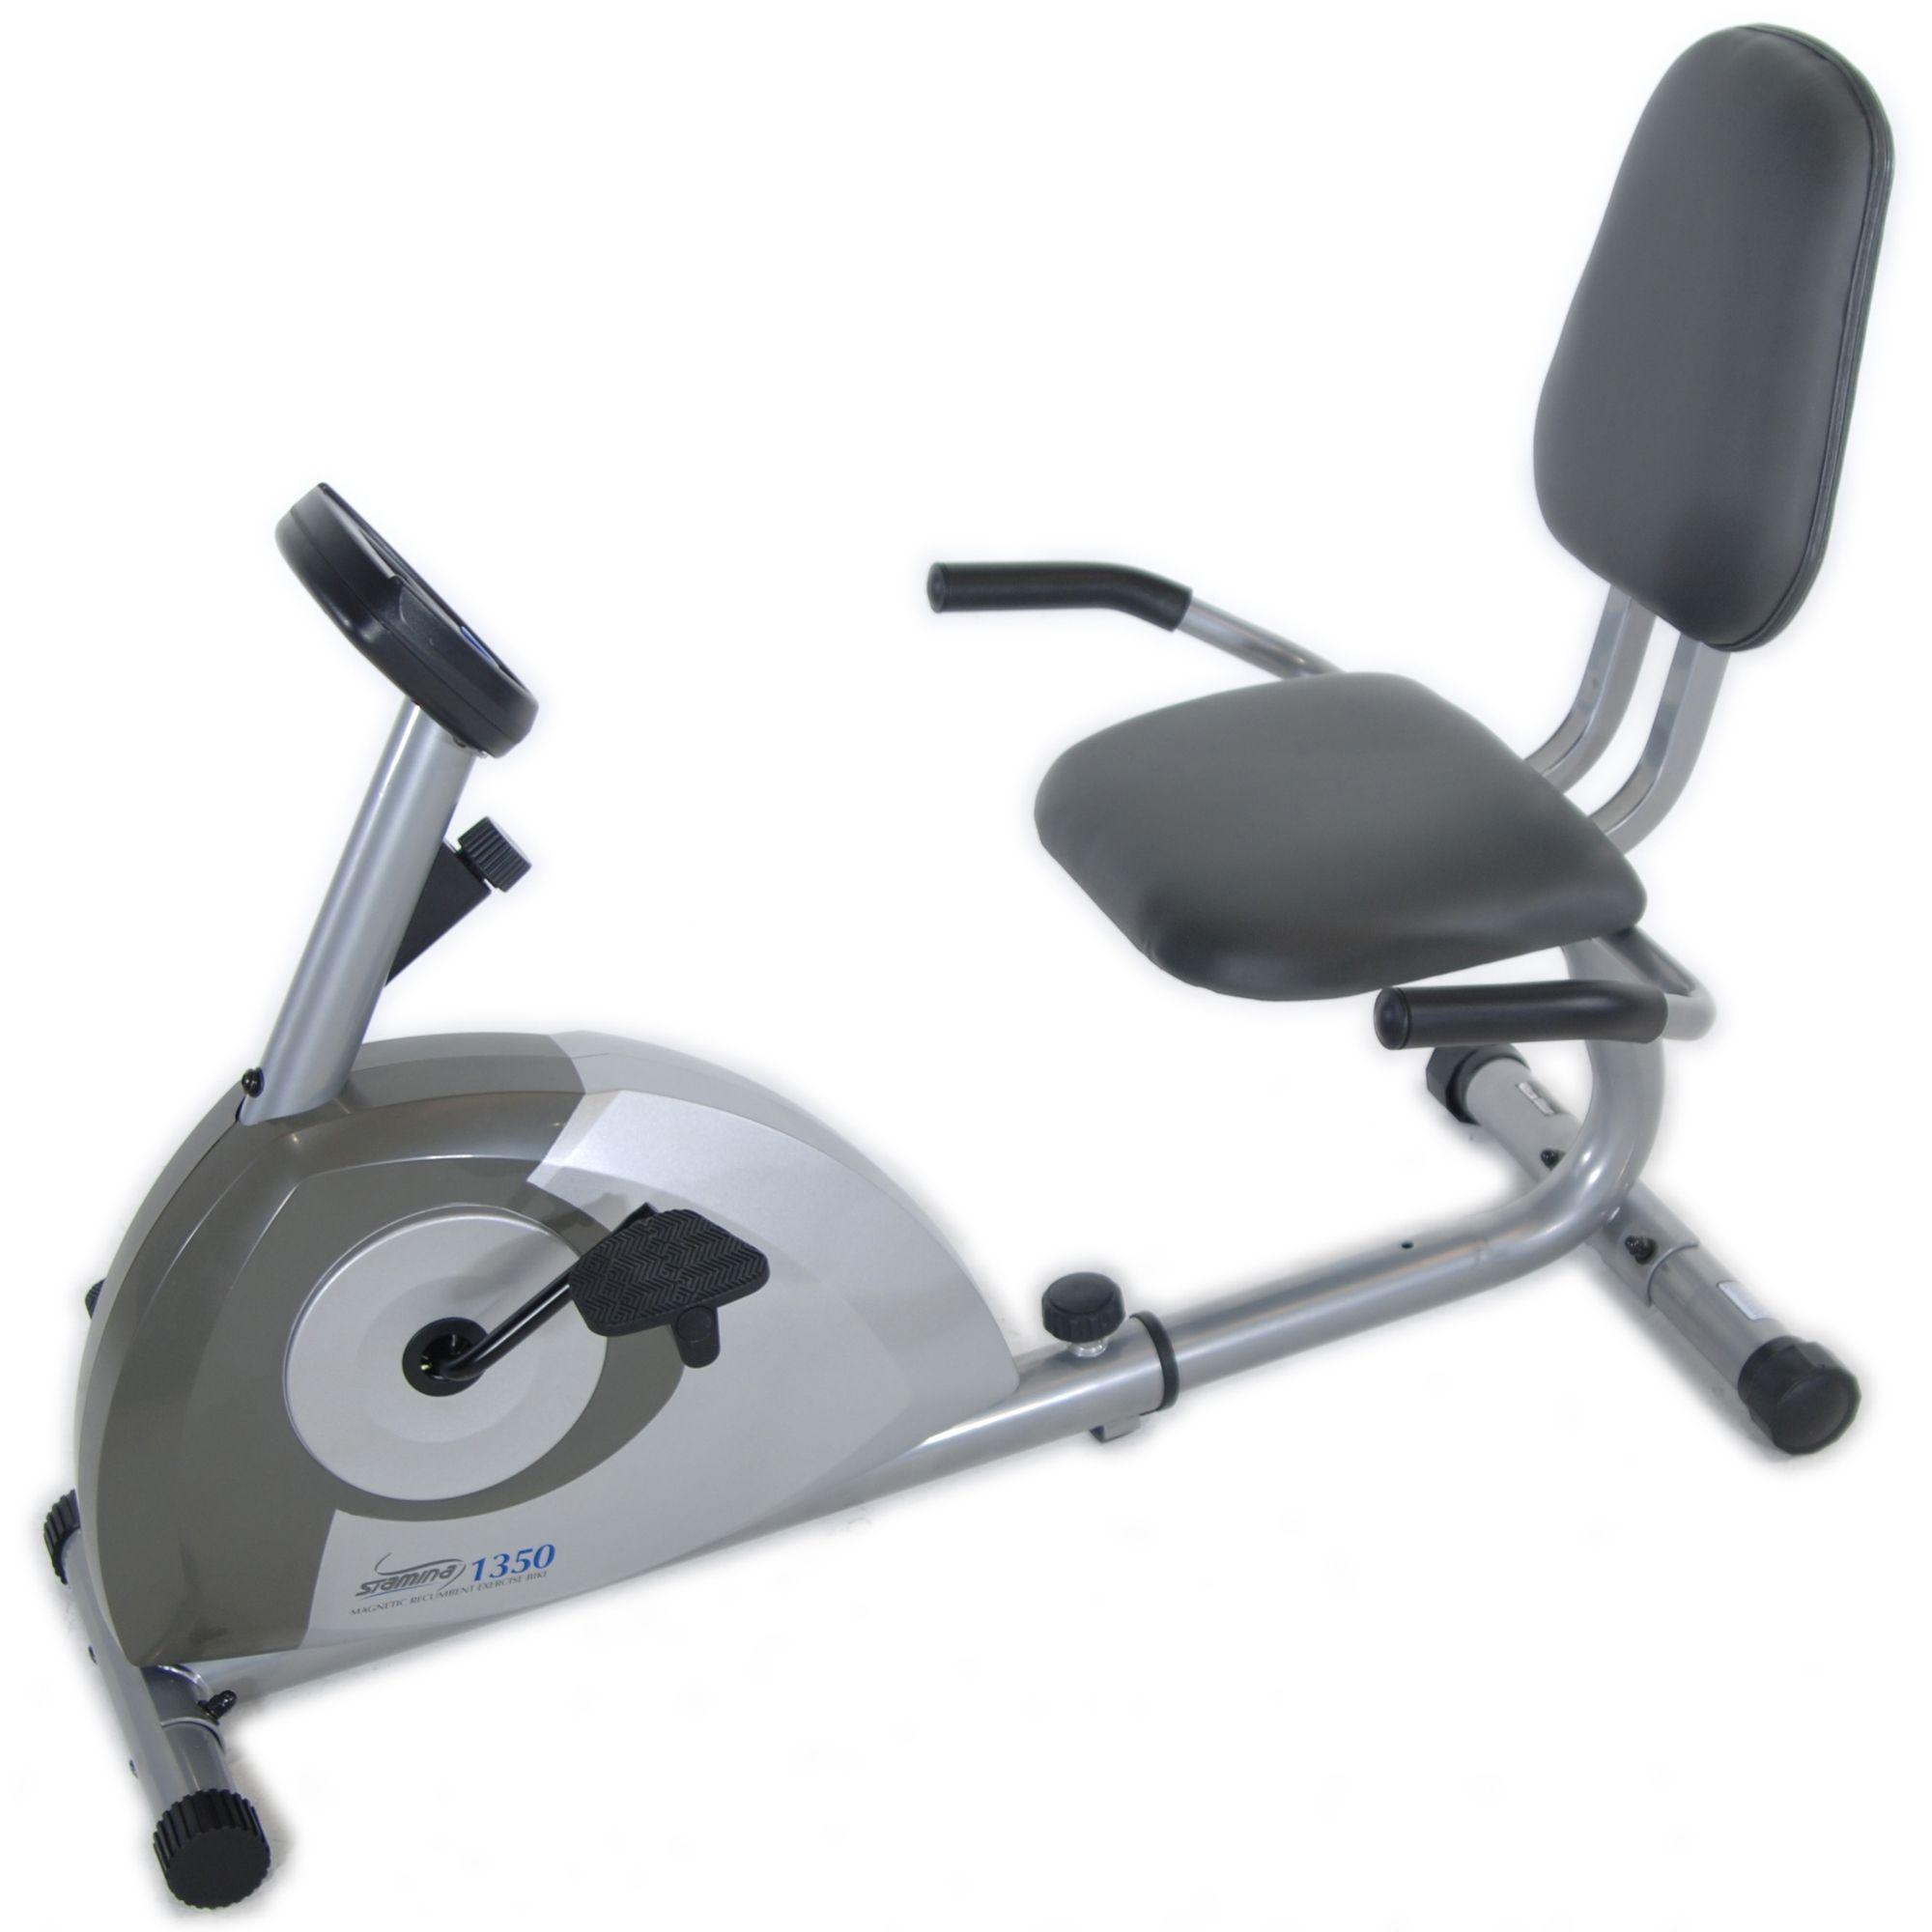 Stamina Magnetic Recumbent 1350 Exercise Bike Fitness Sports Exercise Cycles Recumbent Cycles Best Exercise Bike Exercise Bike Reviews Biking Workout